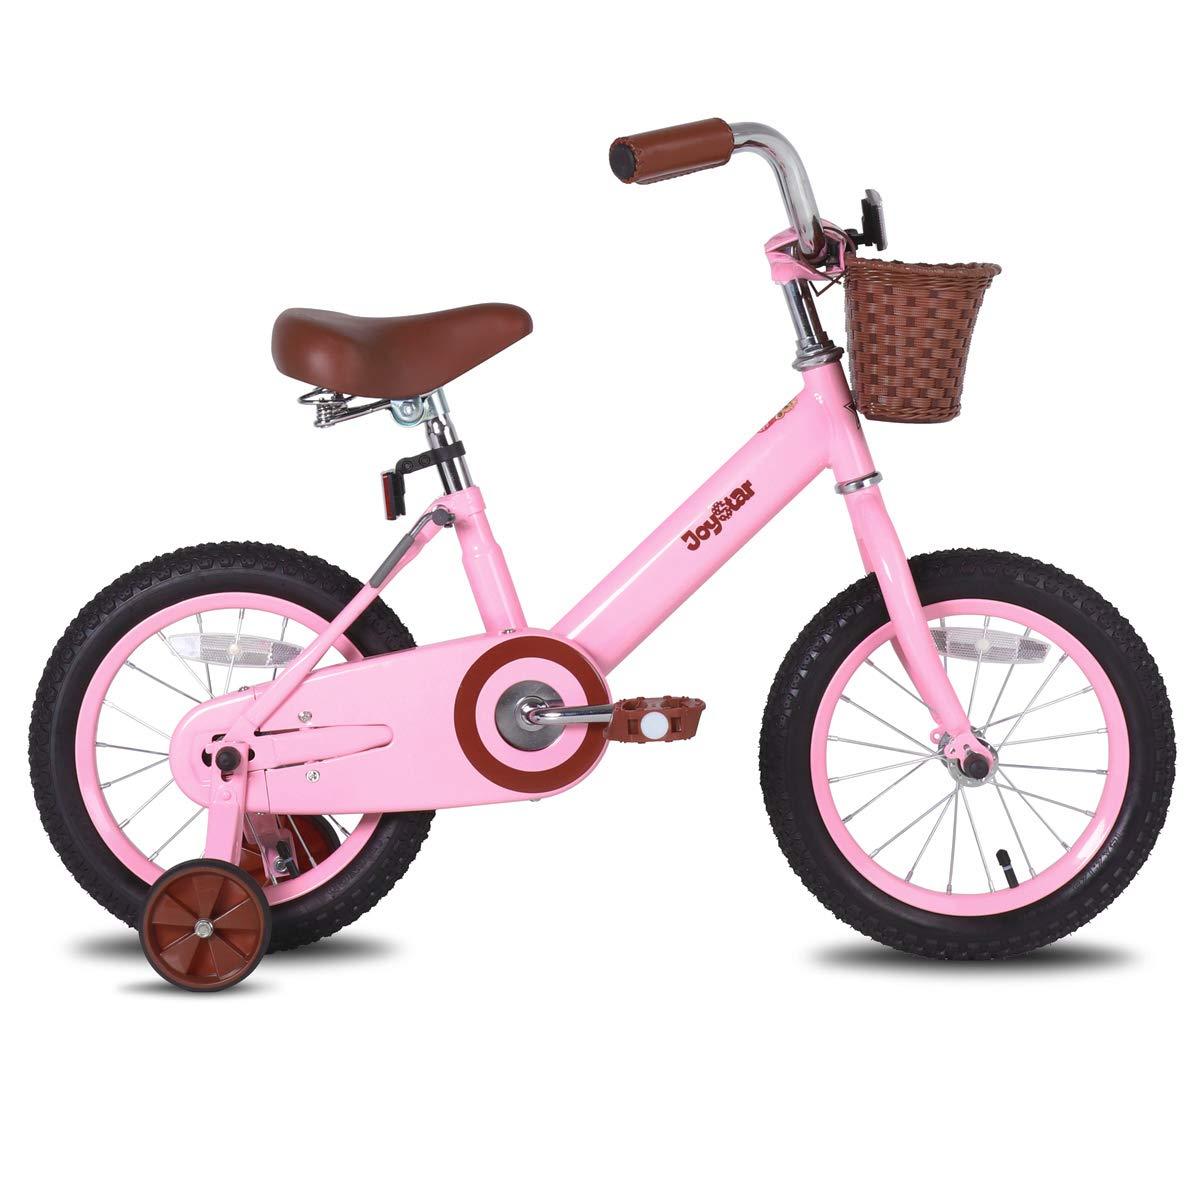 Kids Bike with Basket & Training Wheels - golden birthday gift ideas for her